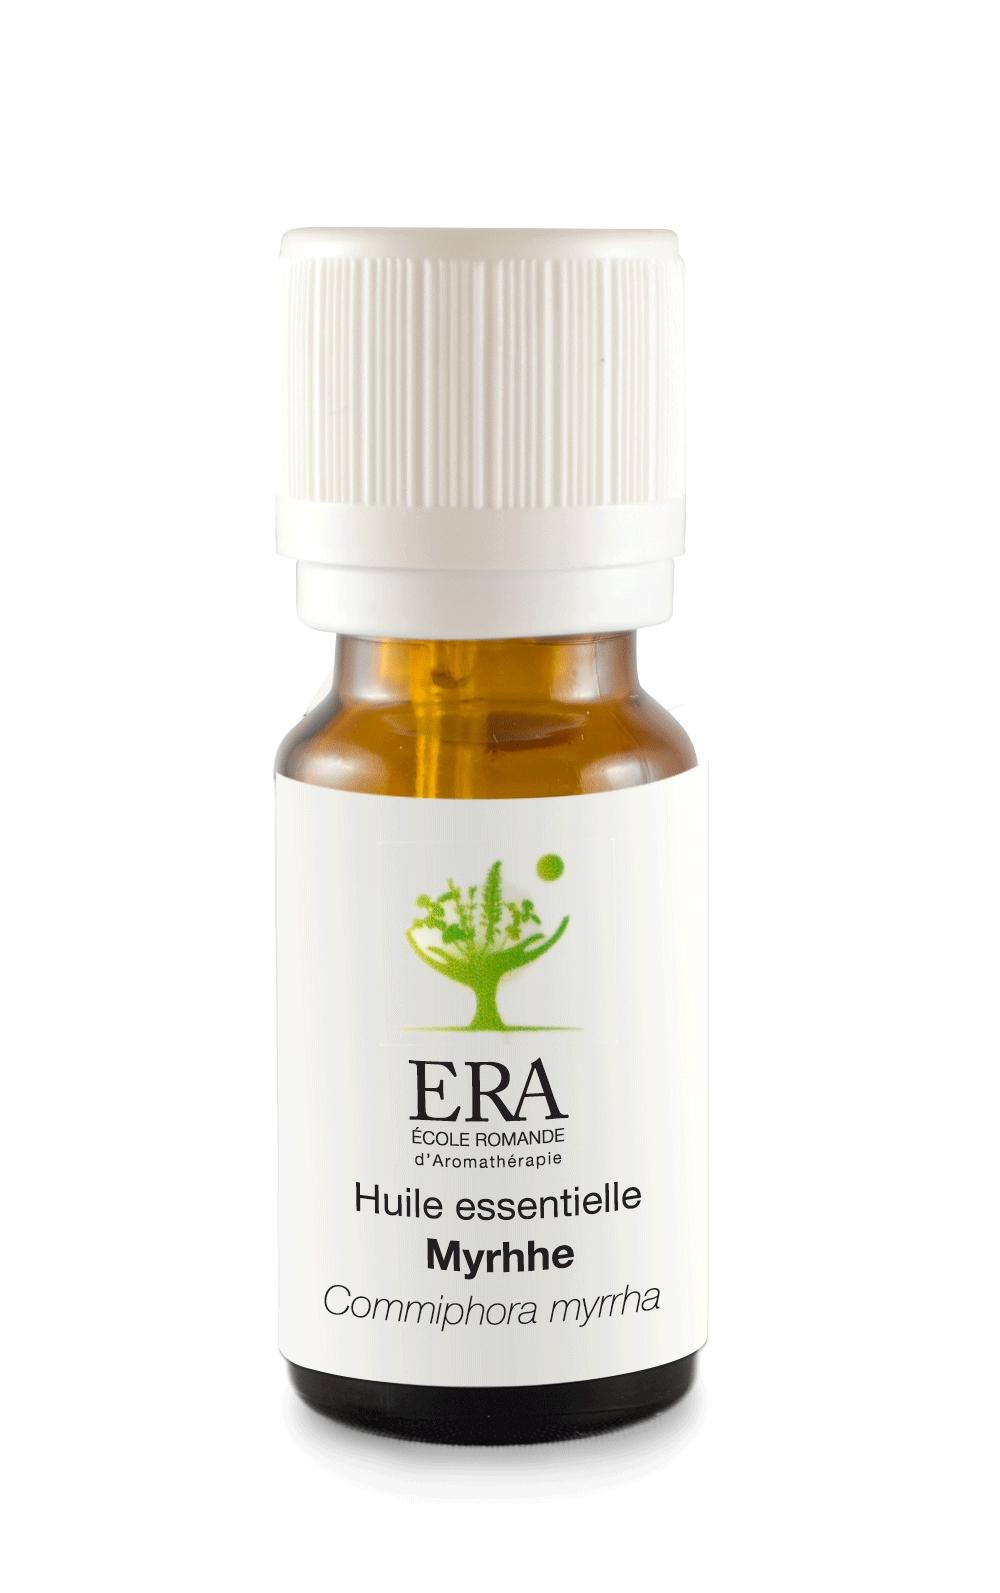 Myrrhe - Commiphora myrrha - Burseracées